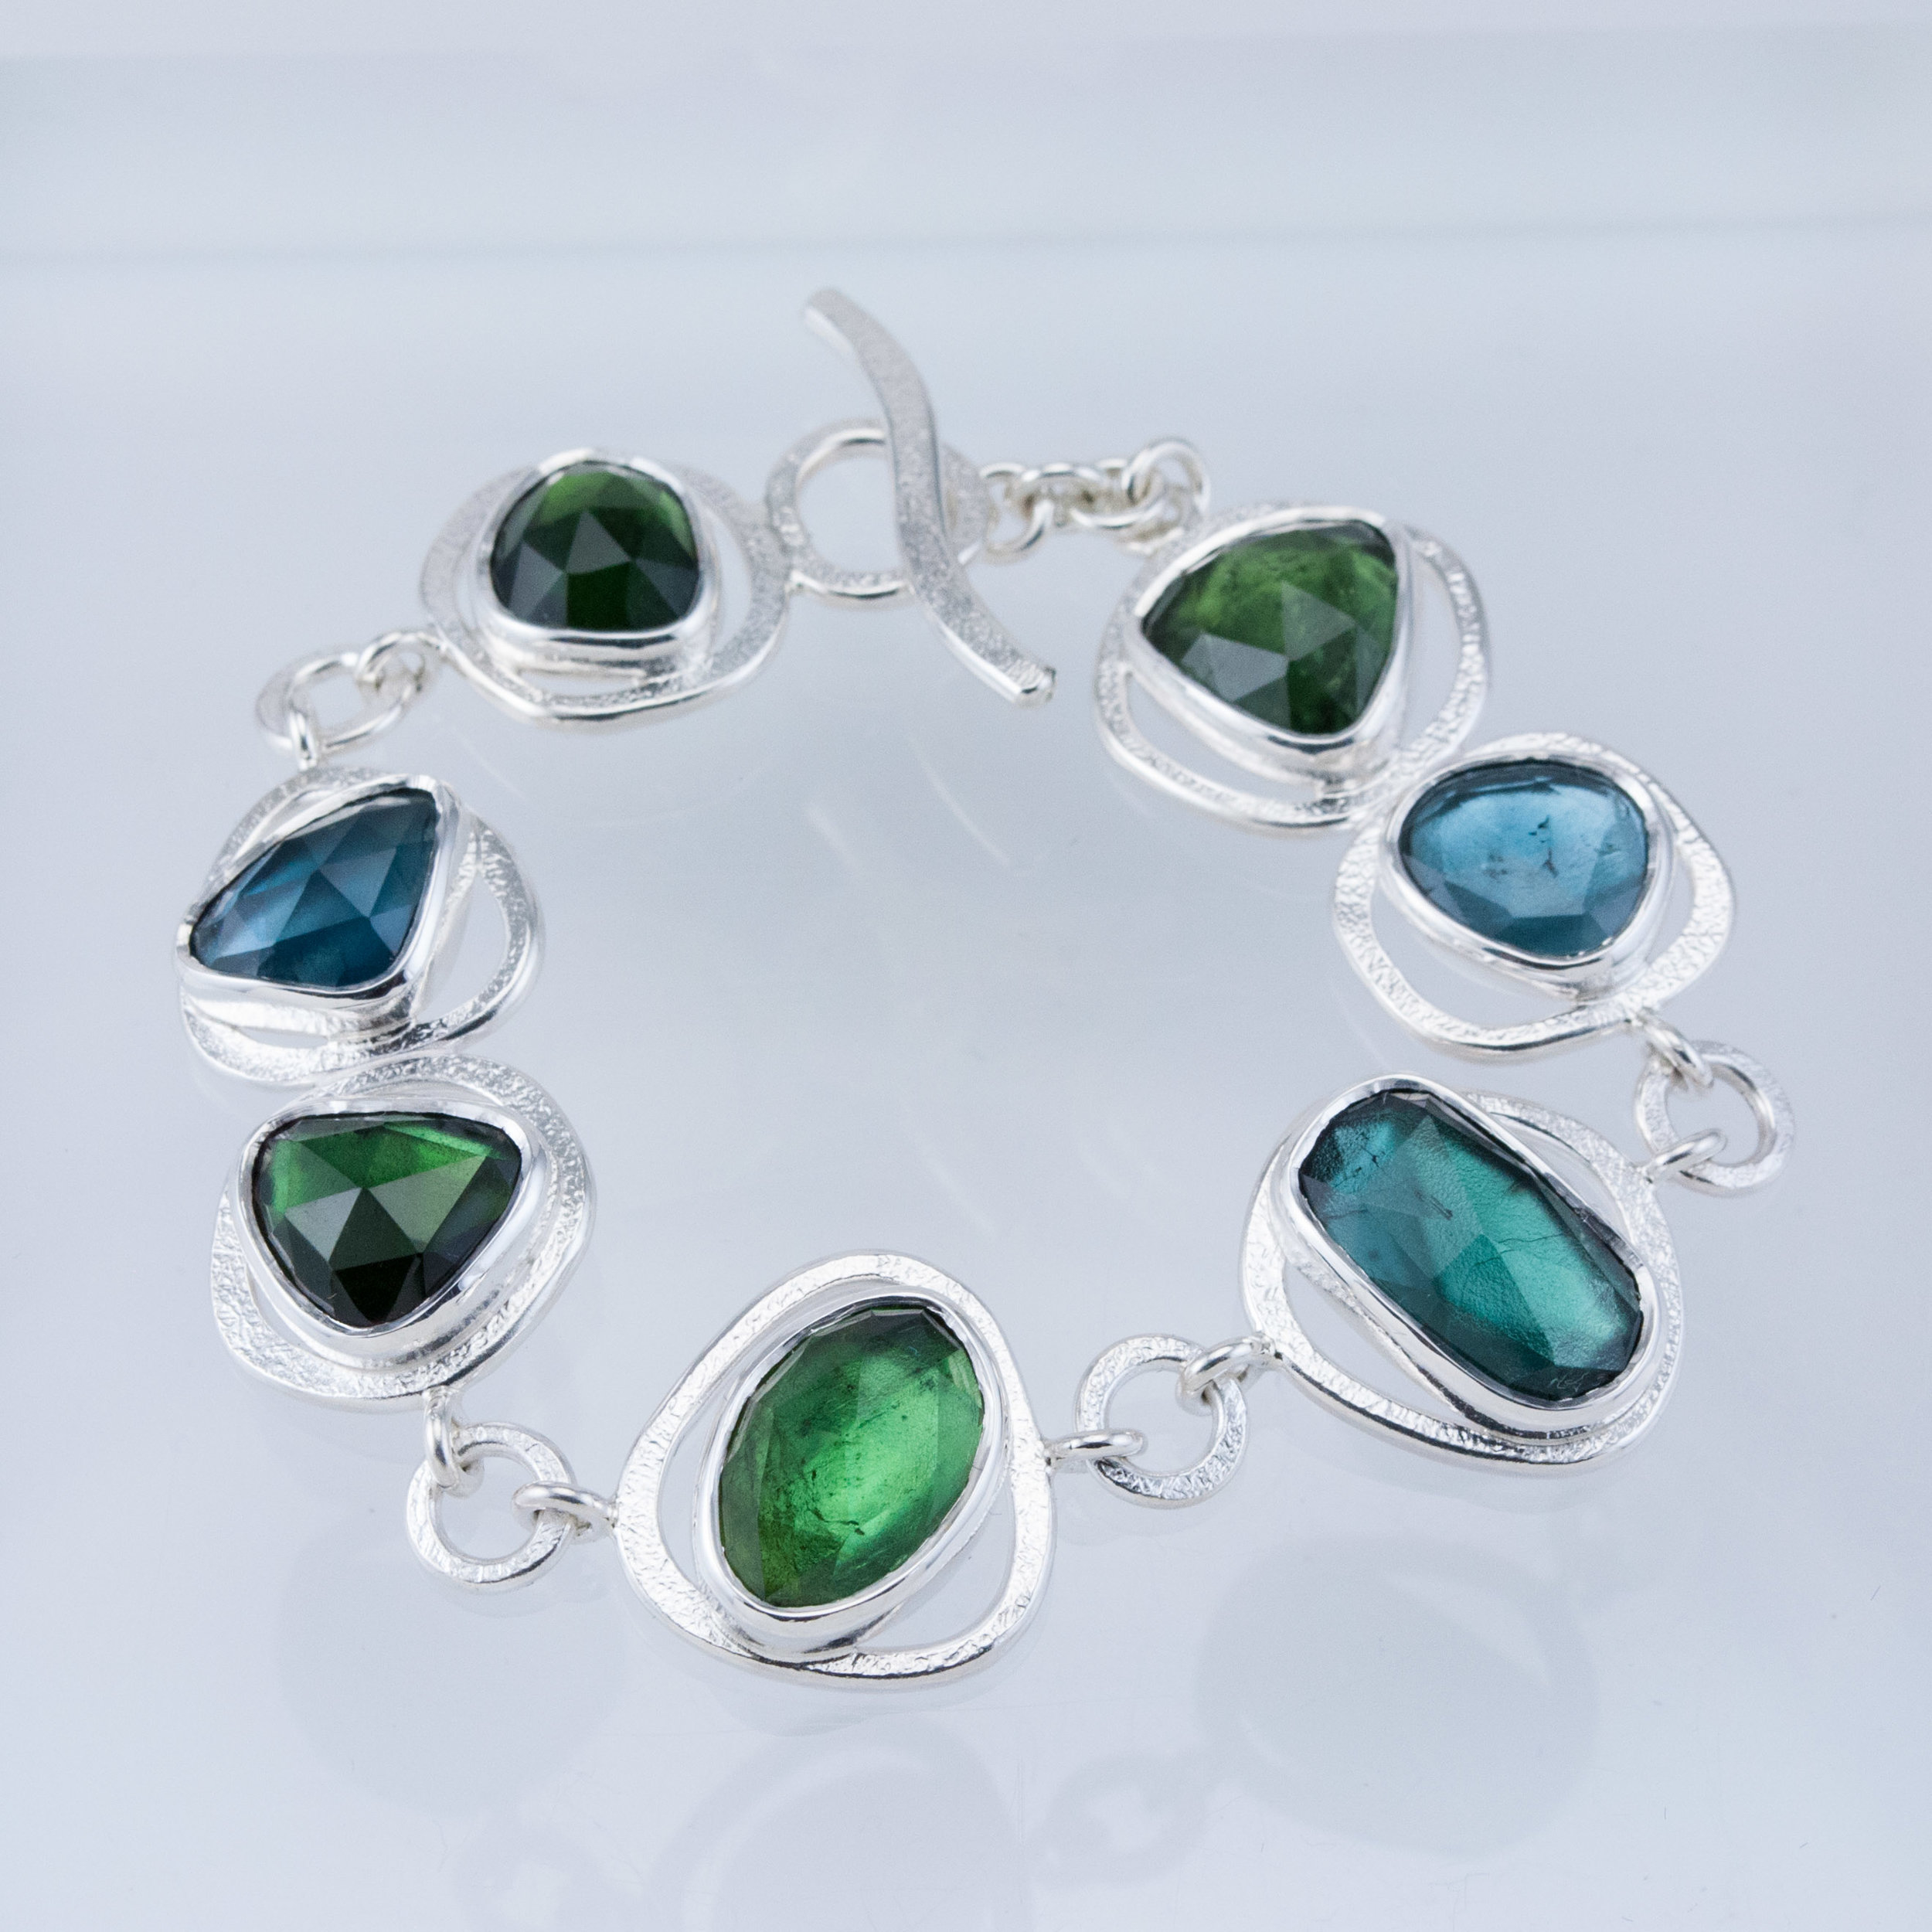 GEO Gem Link Bracelet with Tourmalines